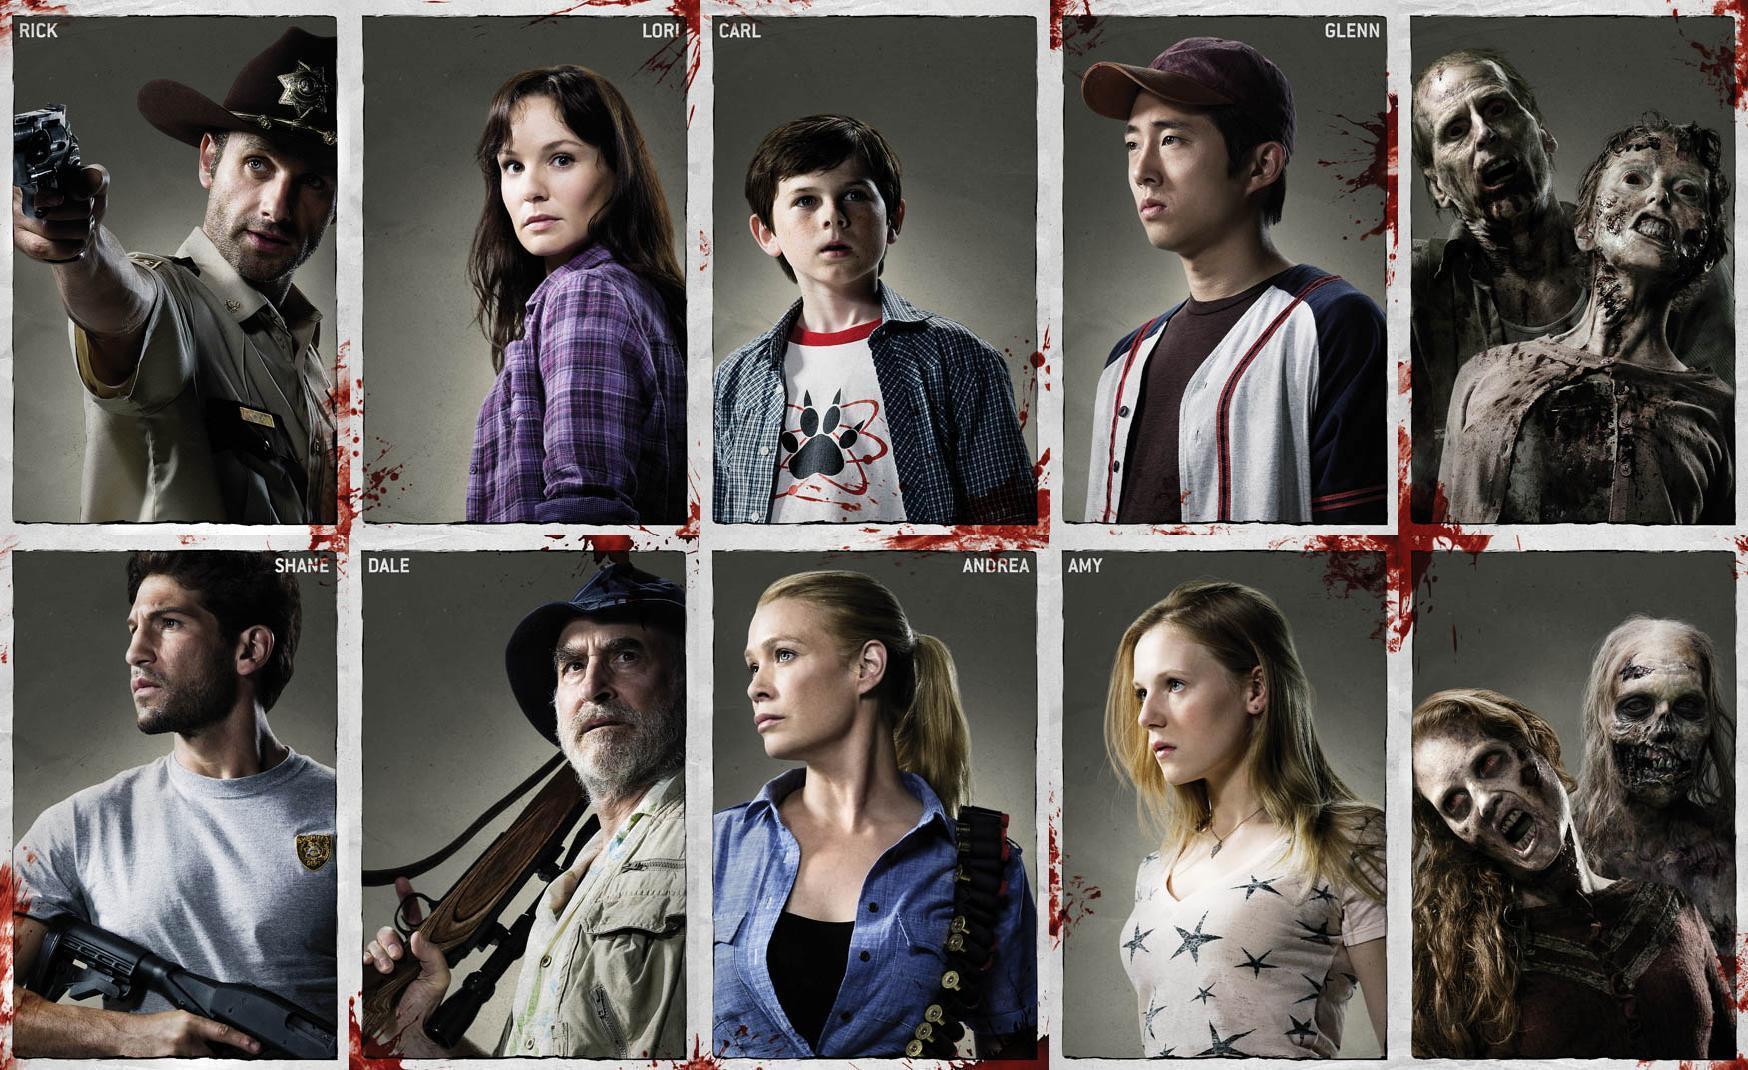 The Walking Dead The-Walking-Dead-the-walking-dead-15760941-1748-1070